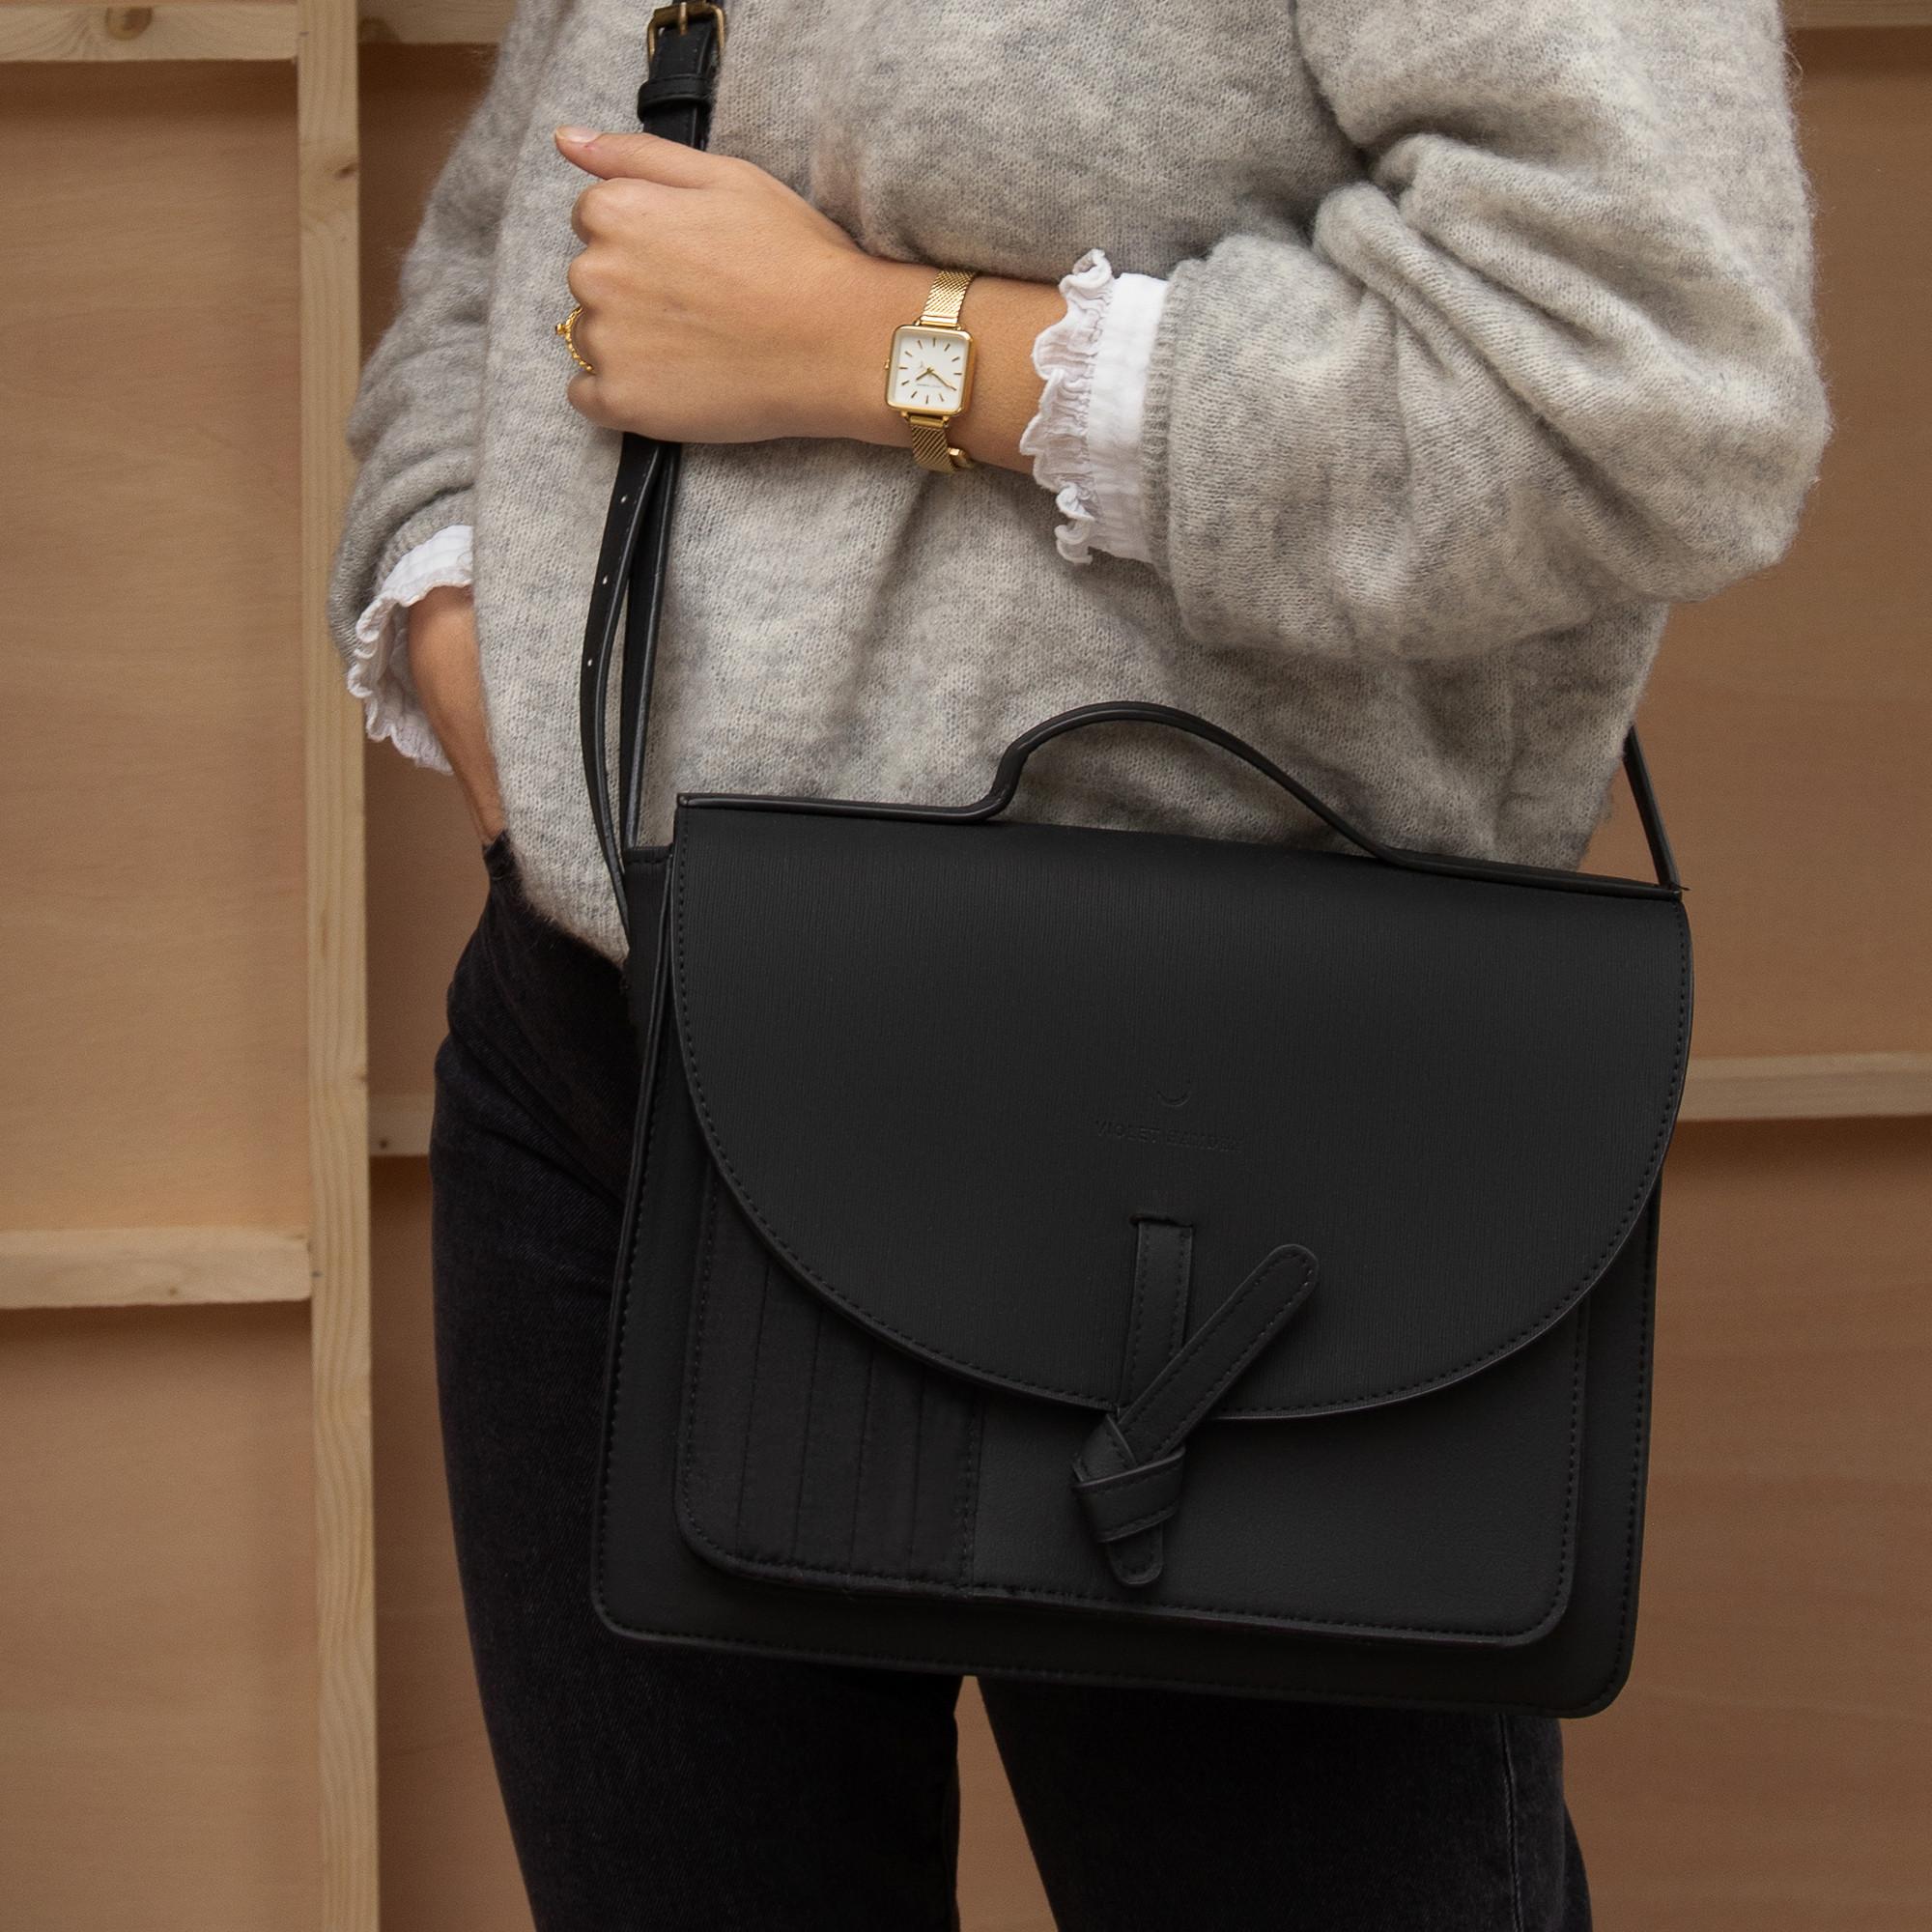 Violet Hamden Essential Bag Midnight Black Satchel VH21001